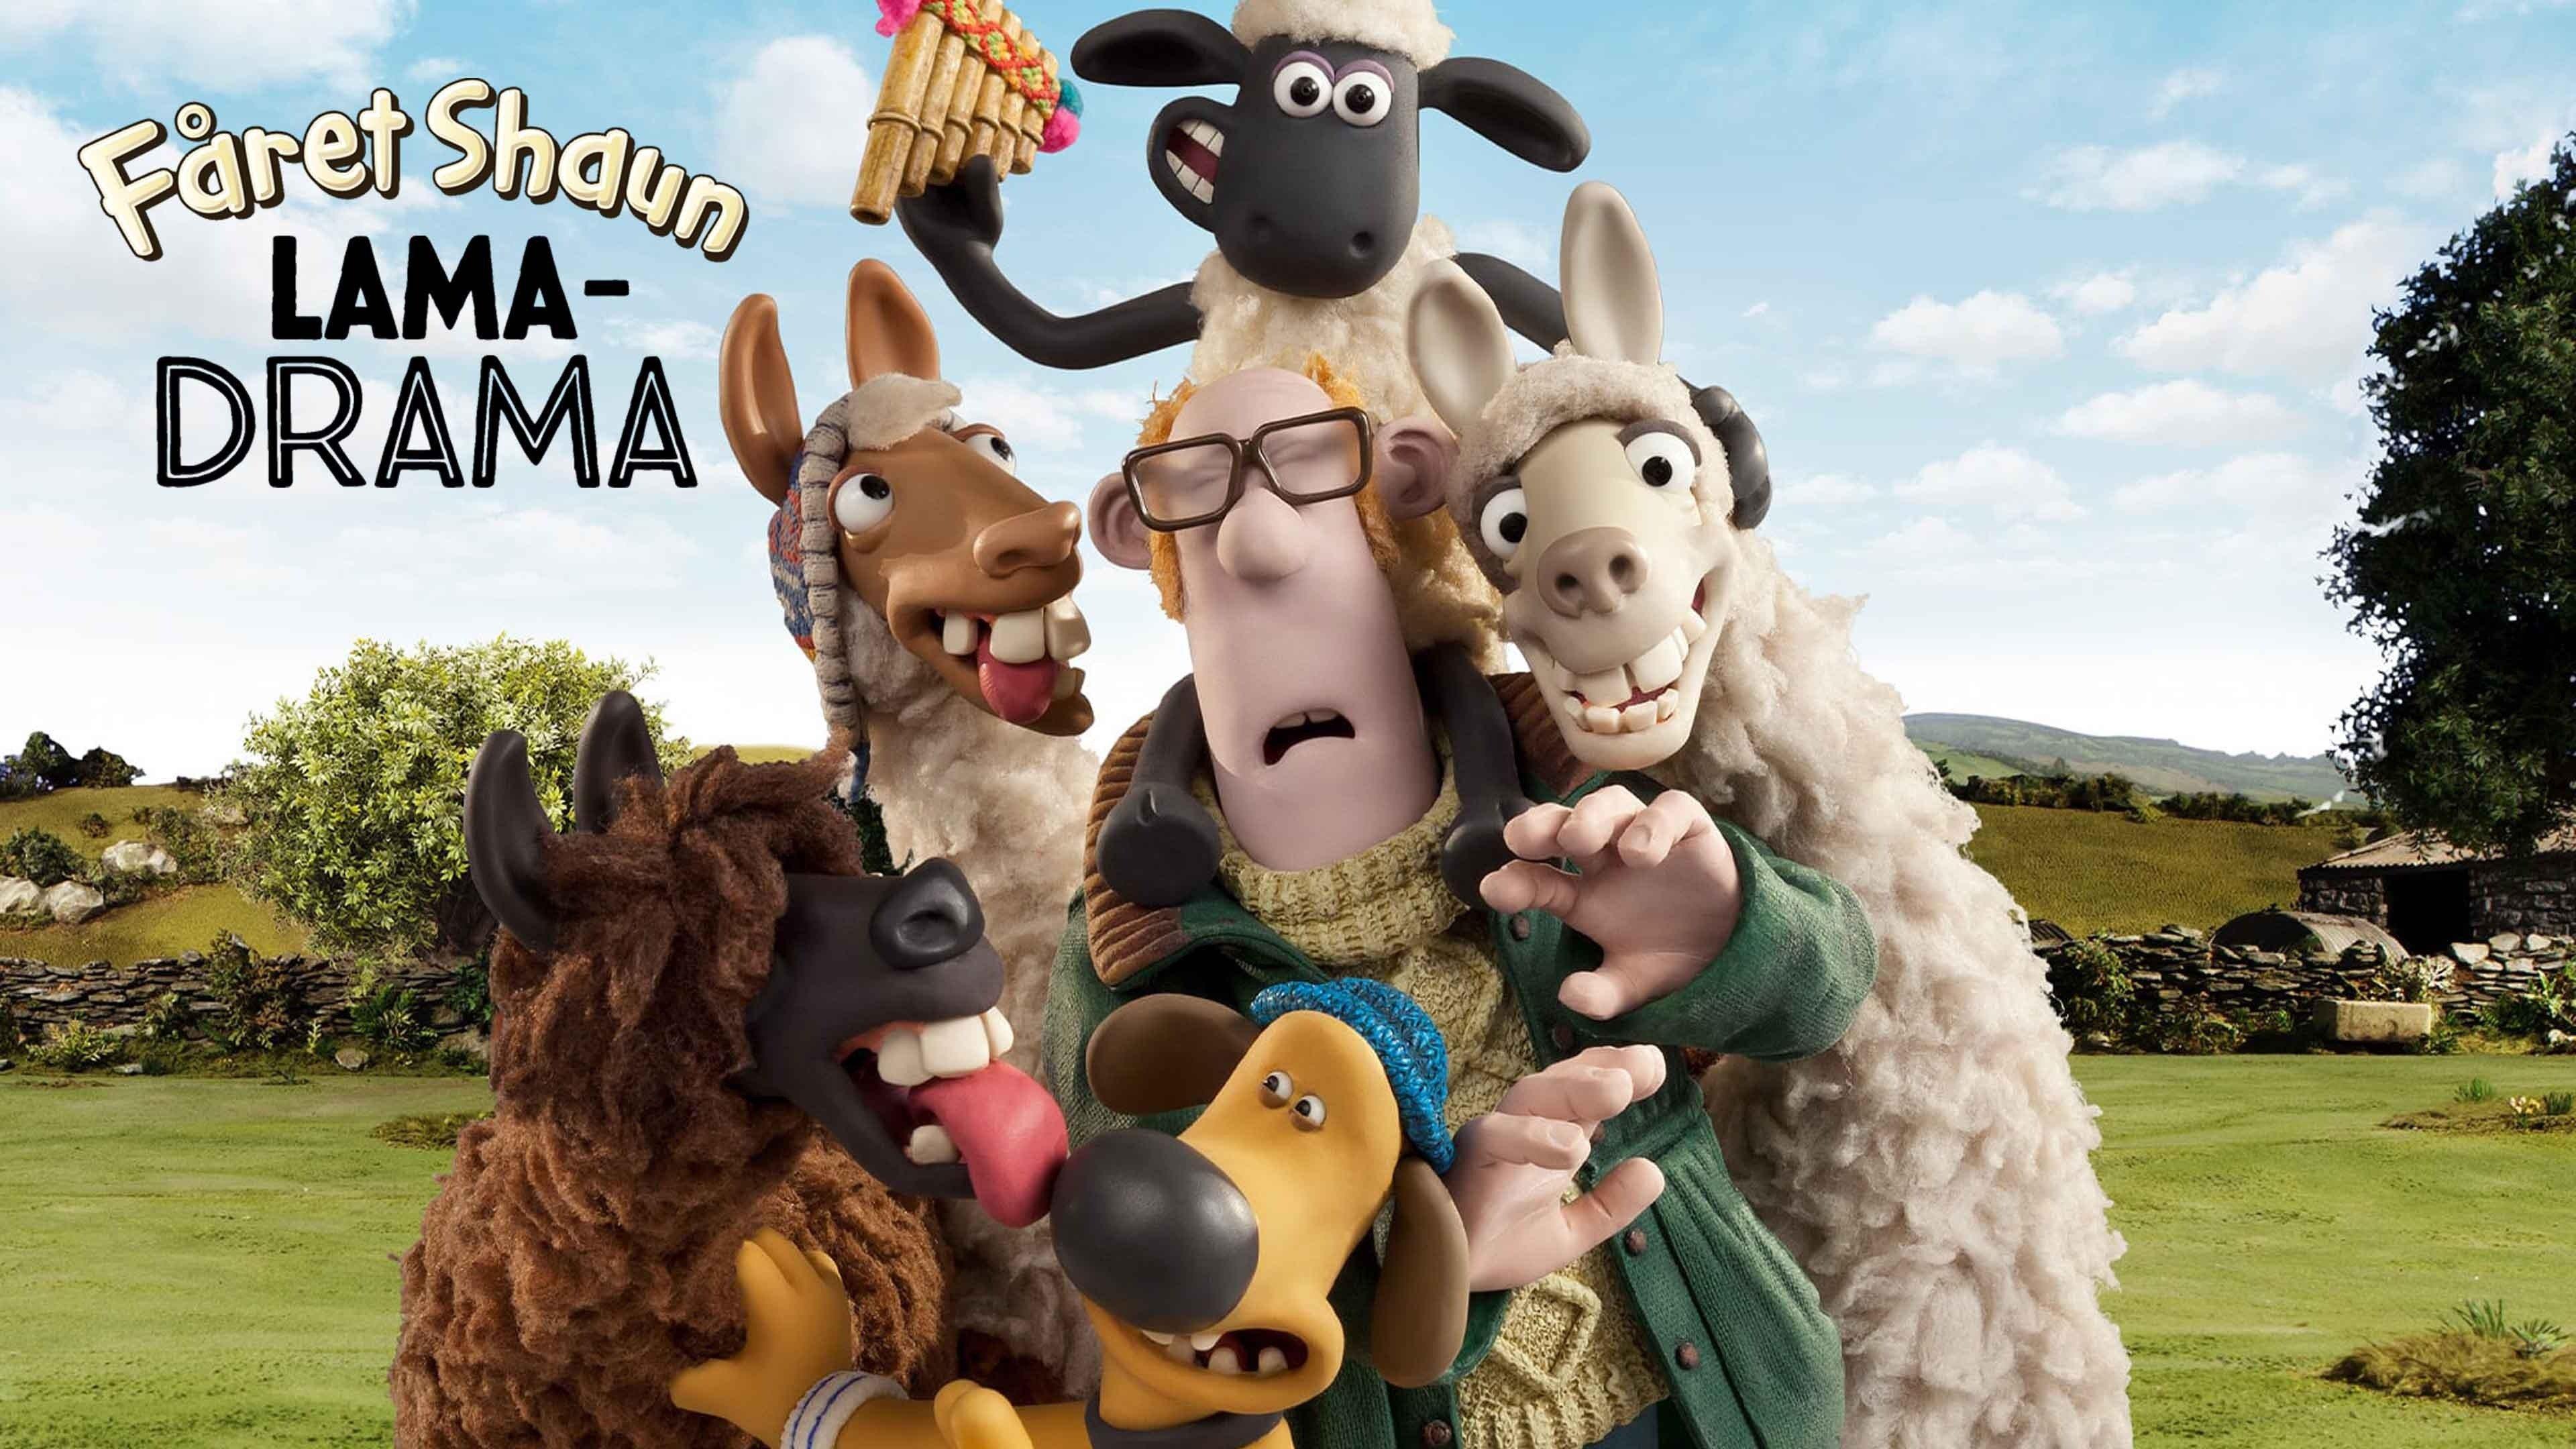 Fåret Shaun: Lama-drama